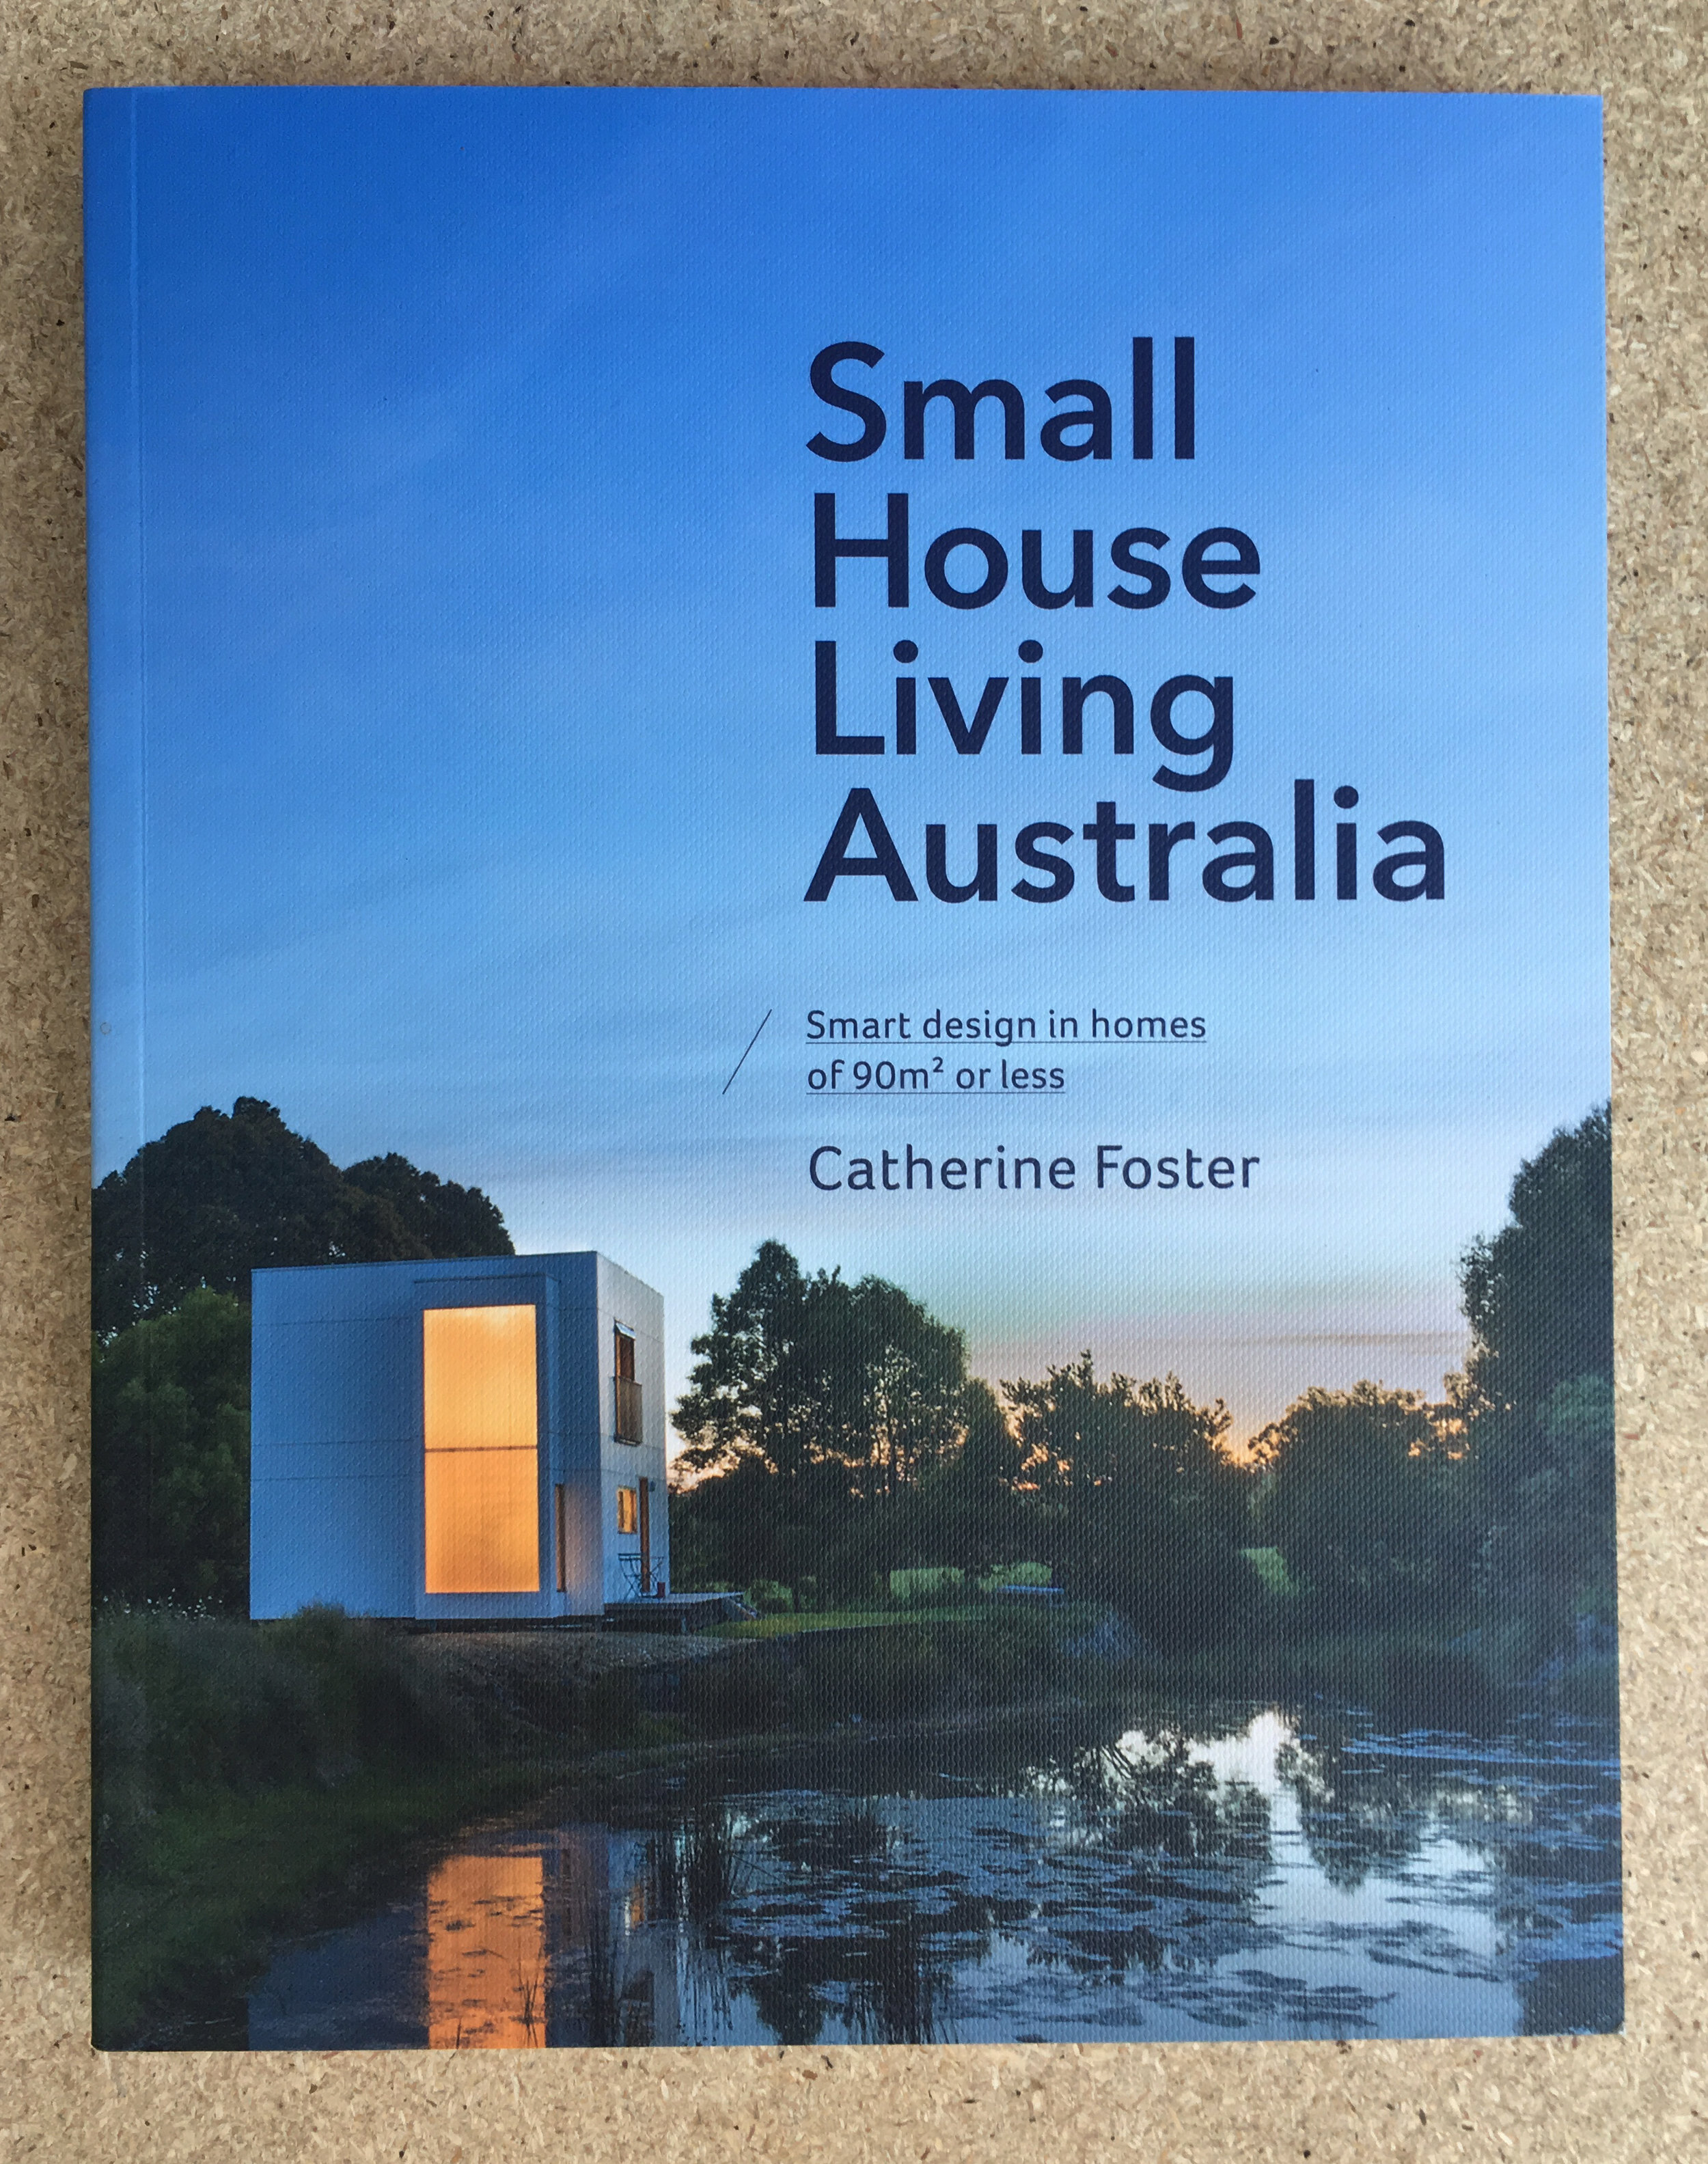 Small House Living Australia Copper House Title.JPG